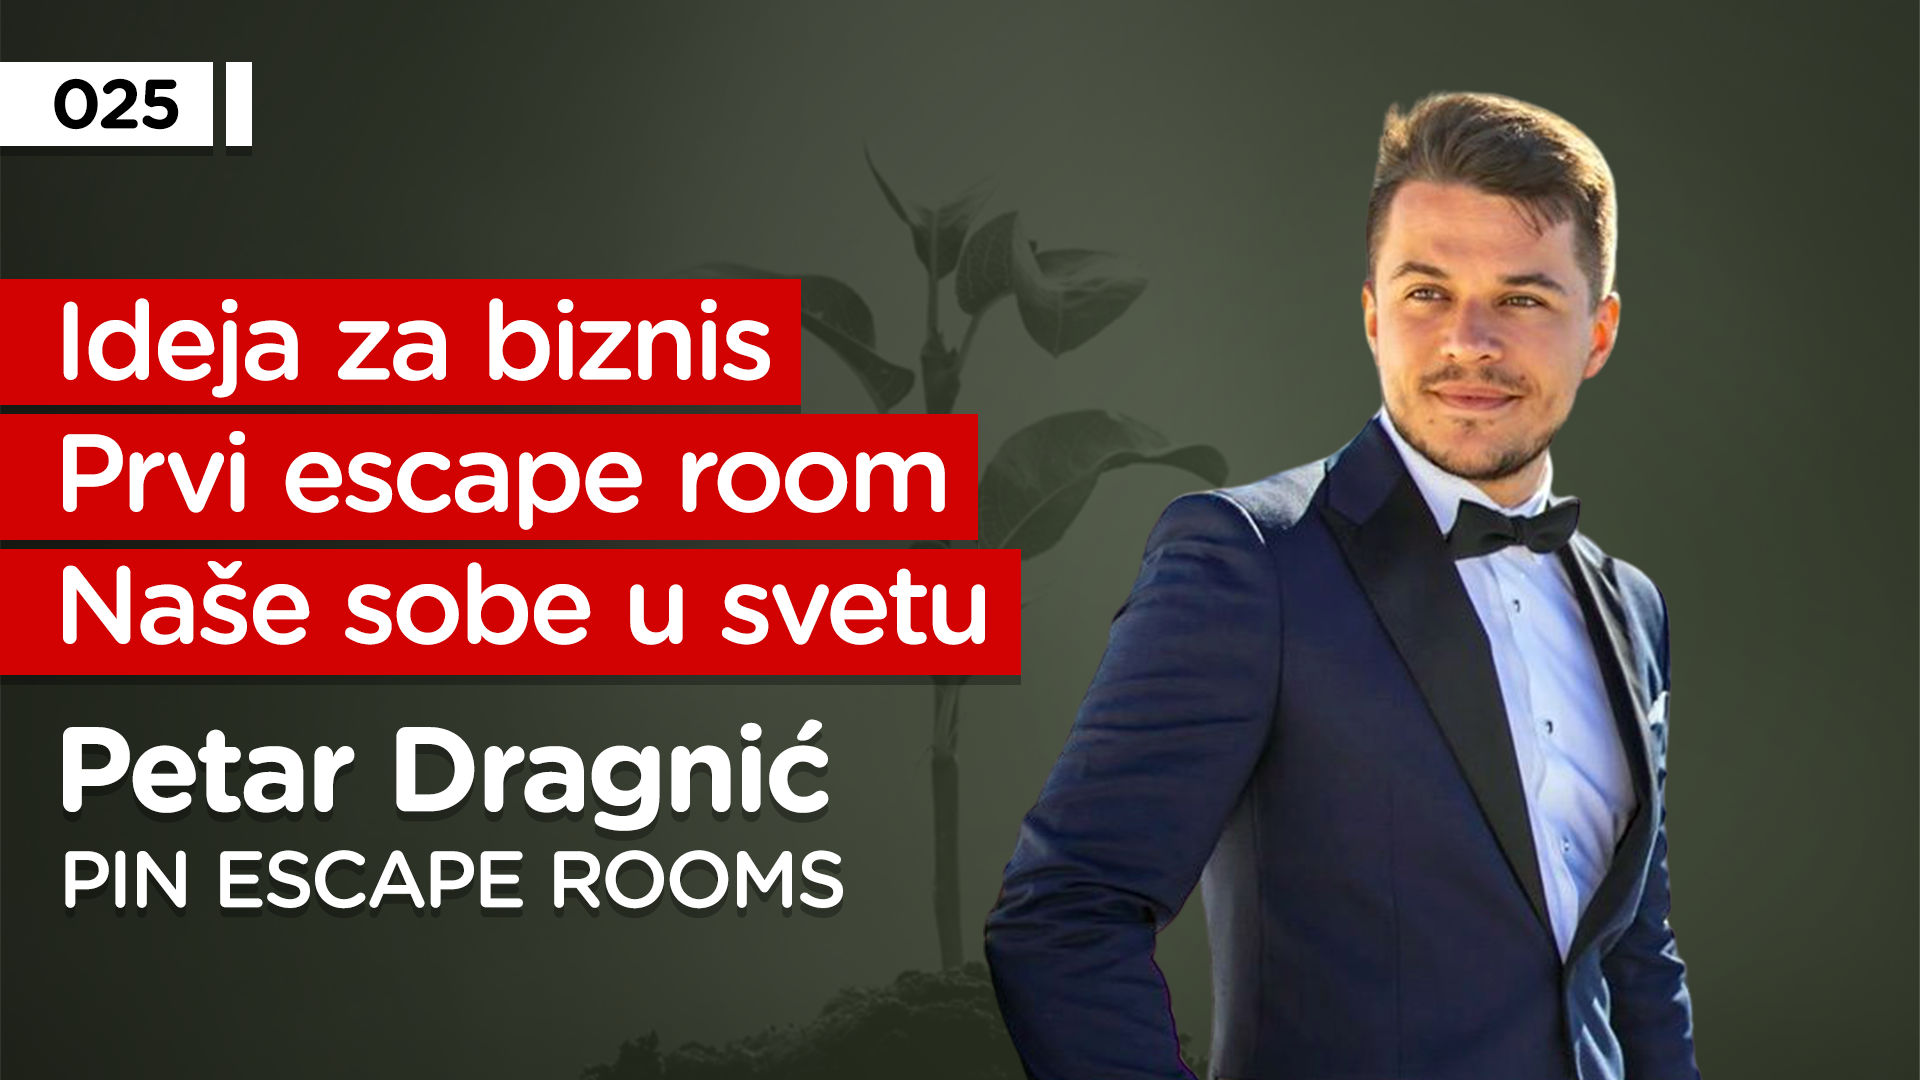 EP025: Petar Dragnić